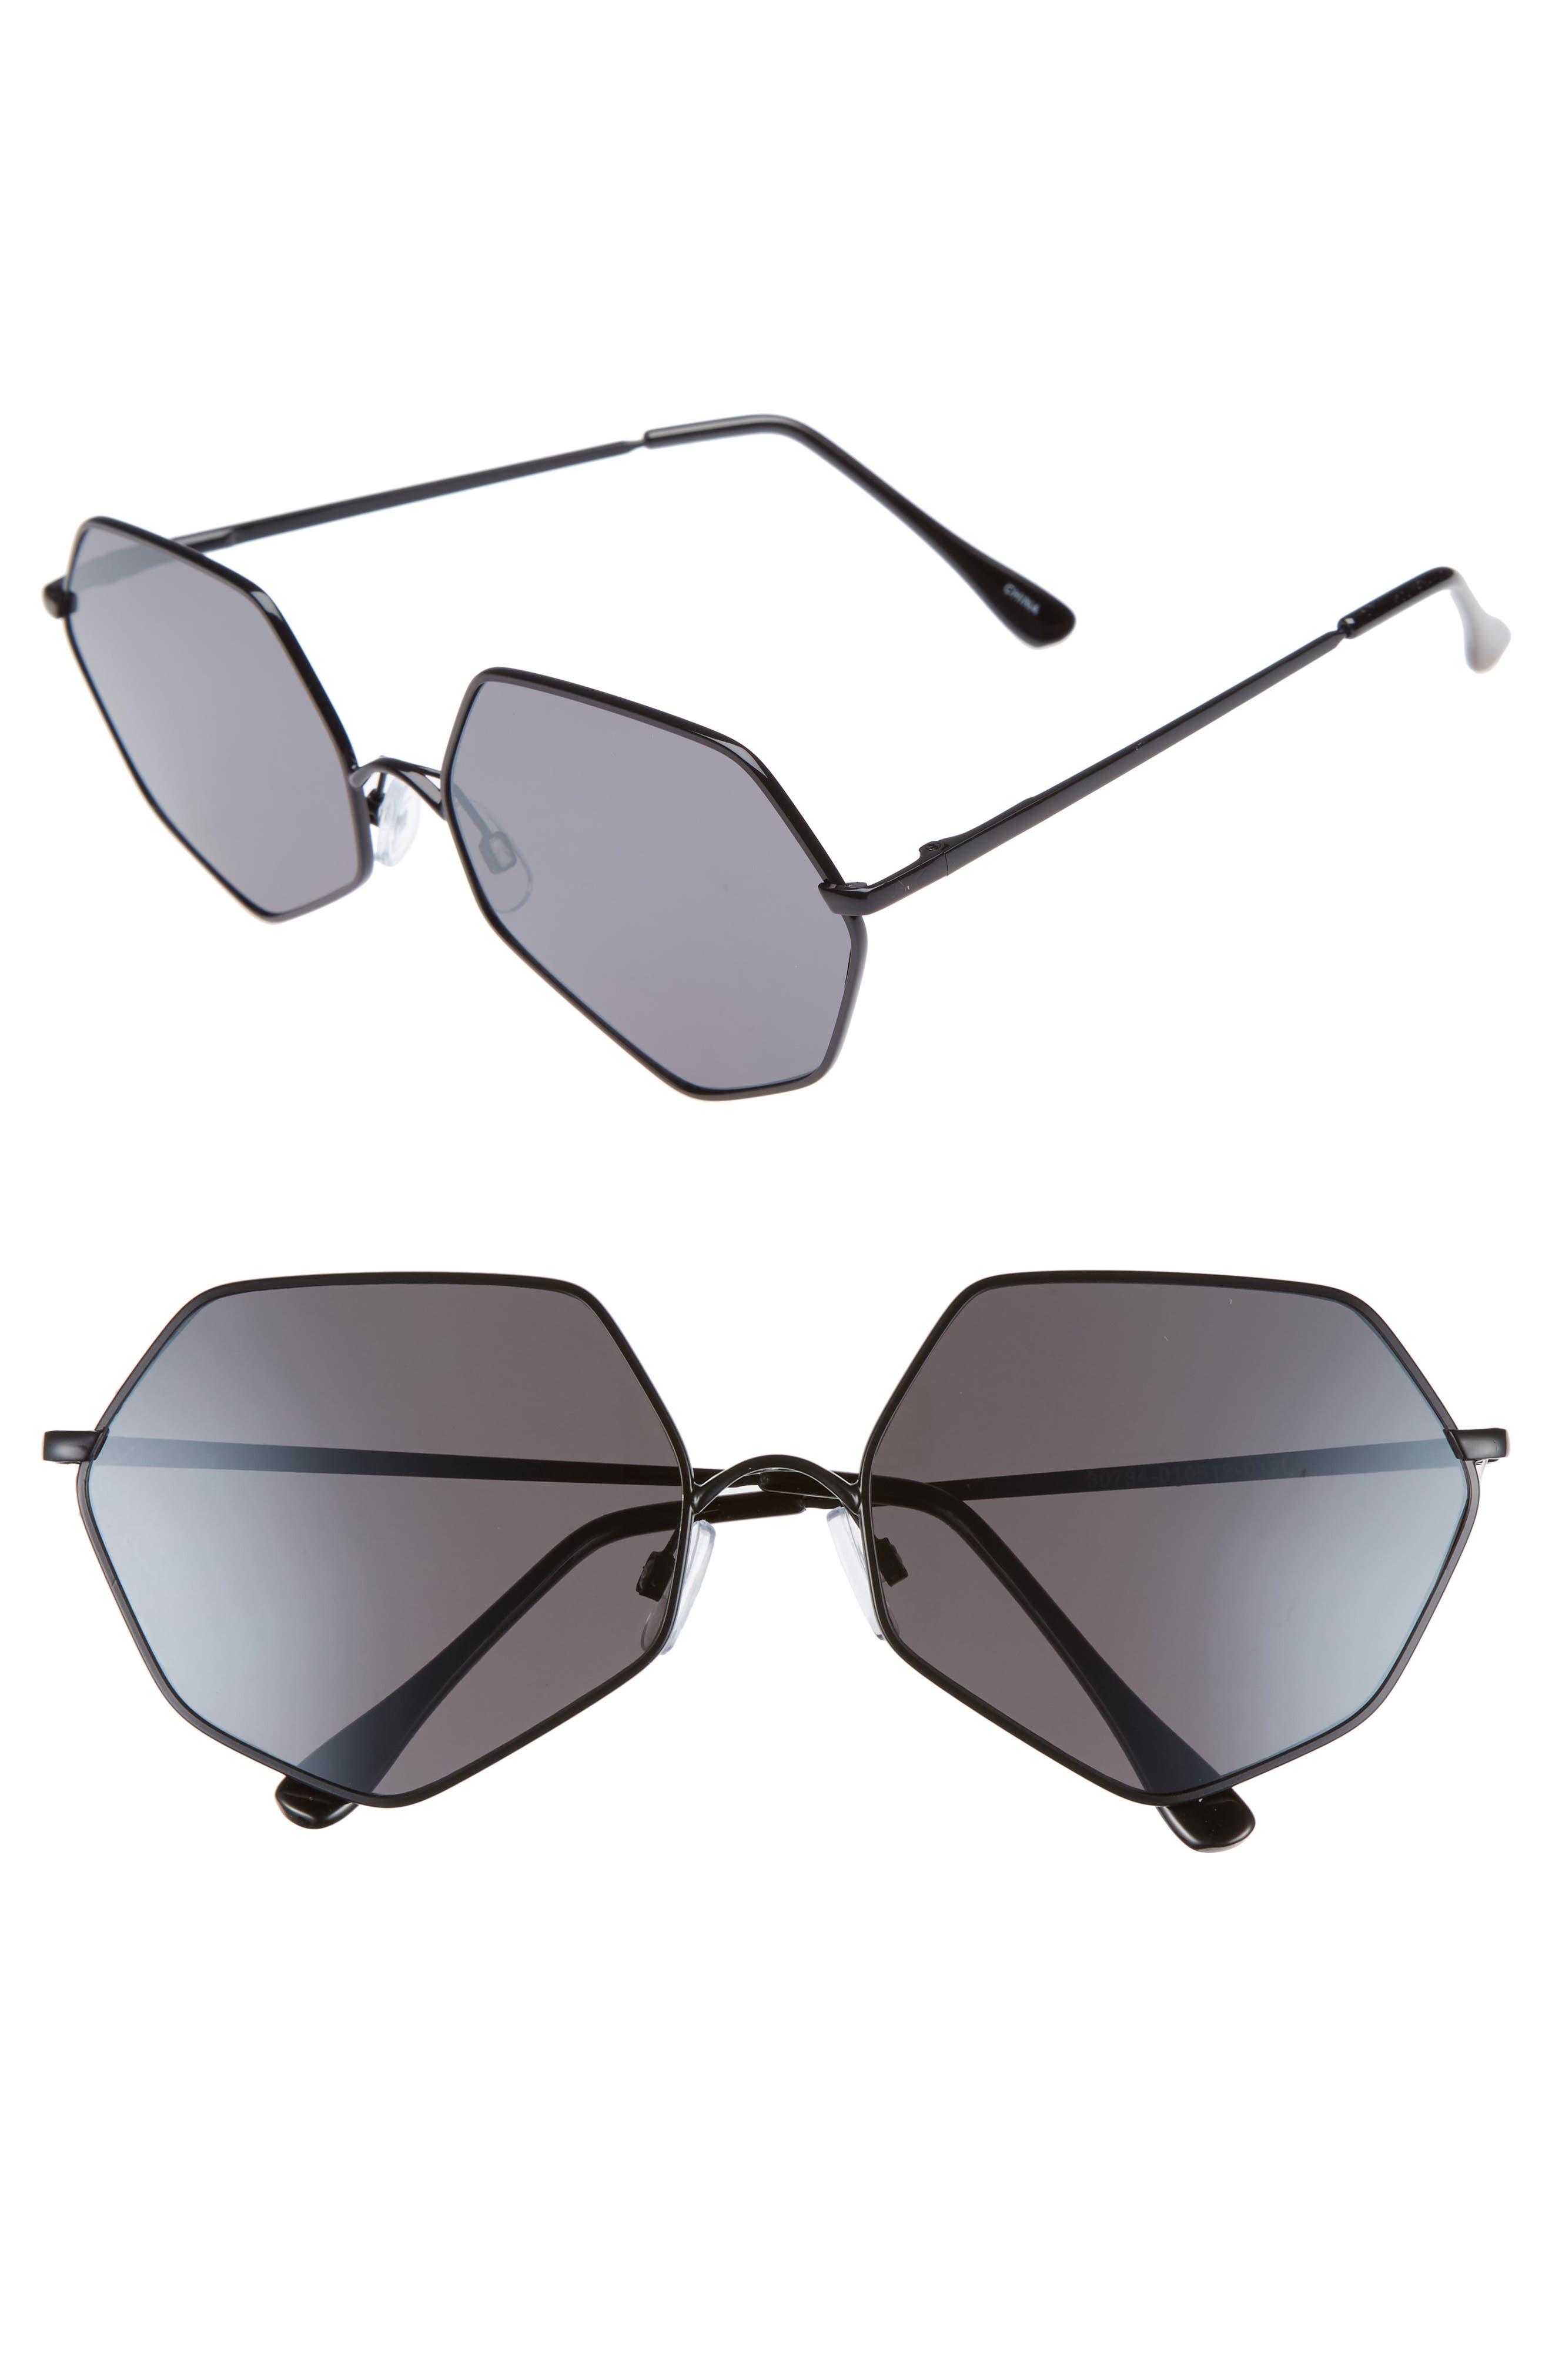 60 mm Geometric Metal Aviator Sunglasses,                             Main thumbnail 1, color,                             Black/ Black